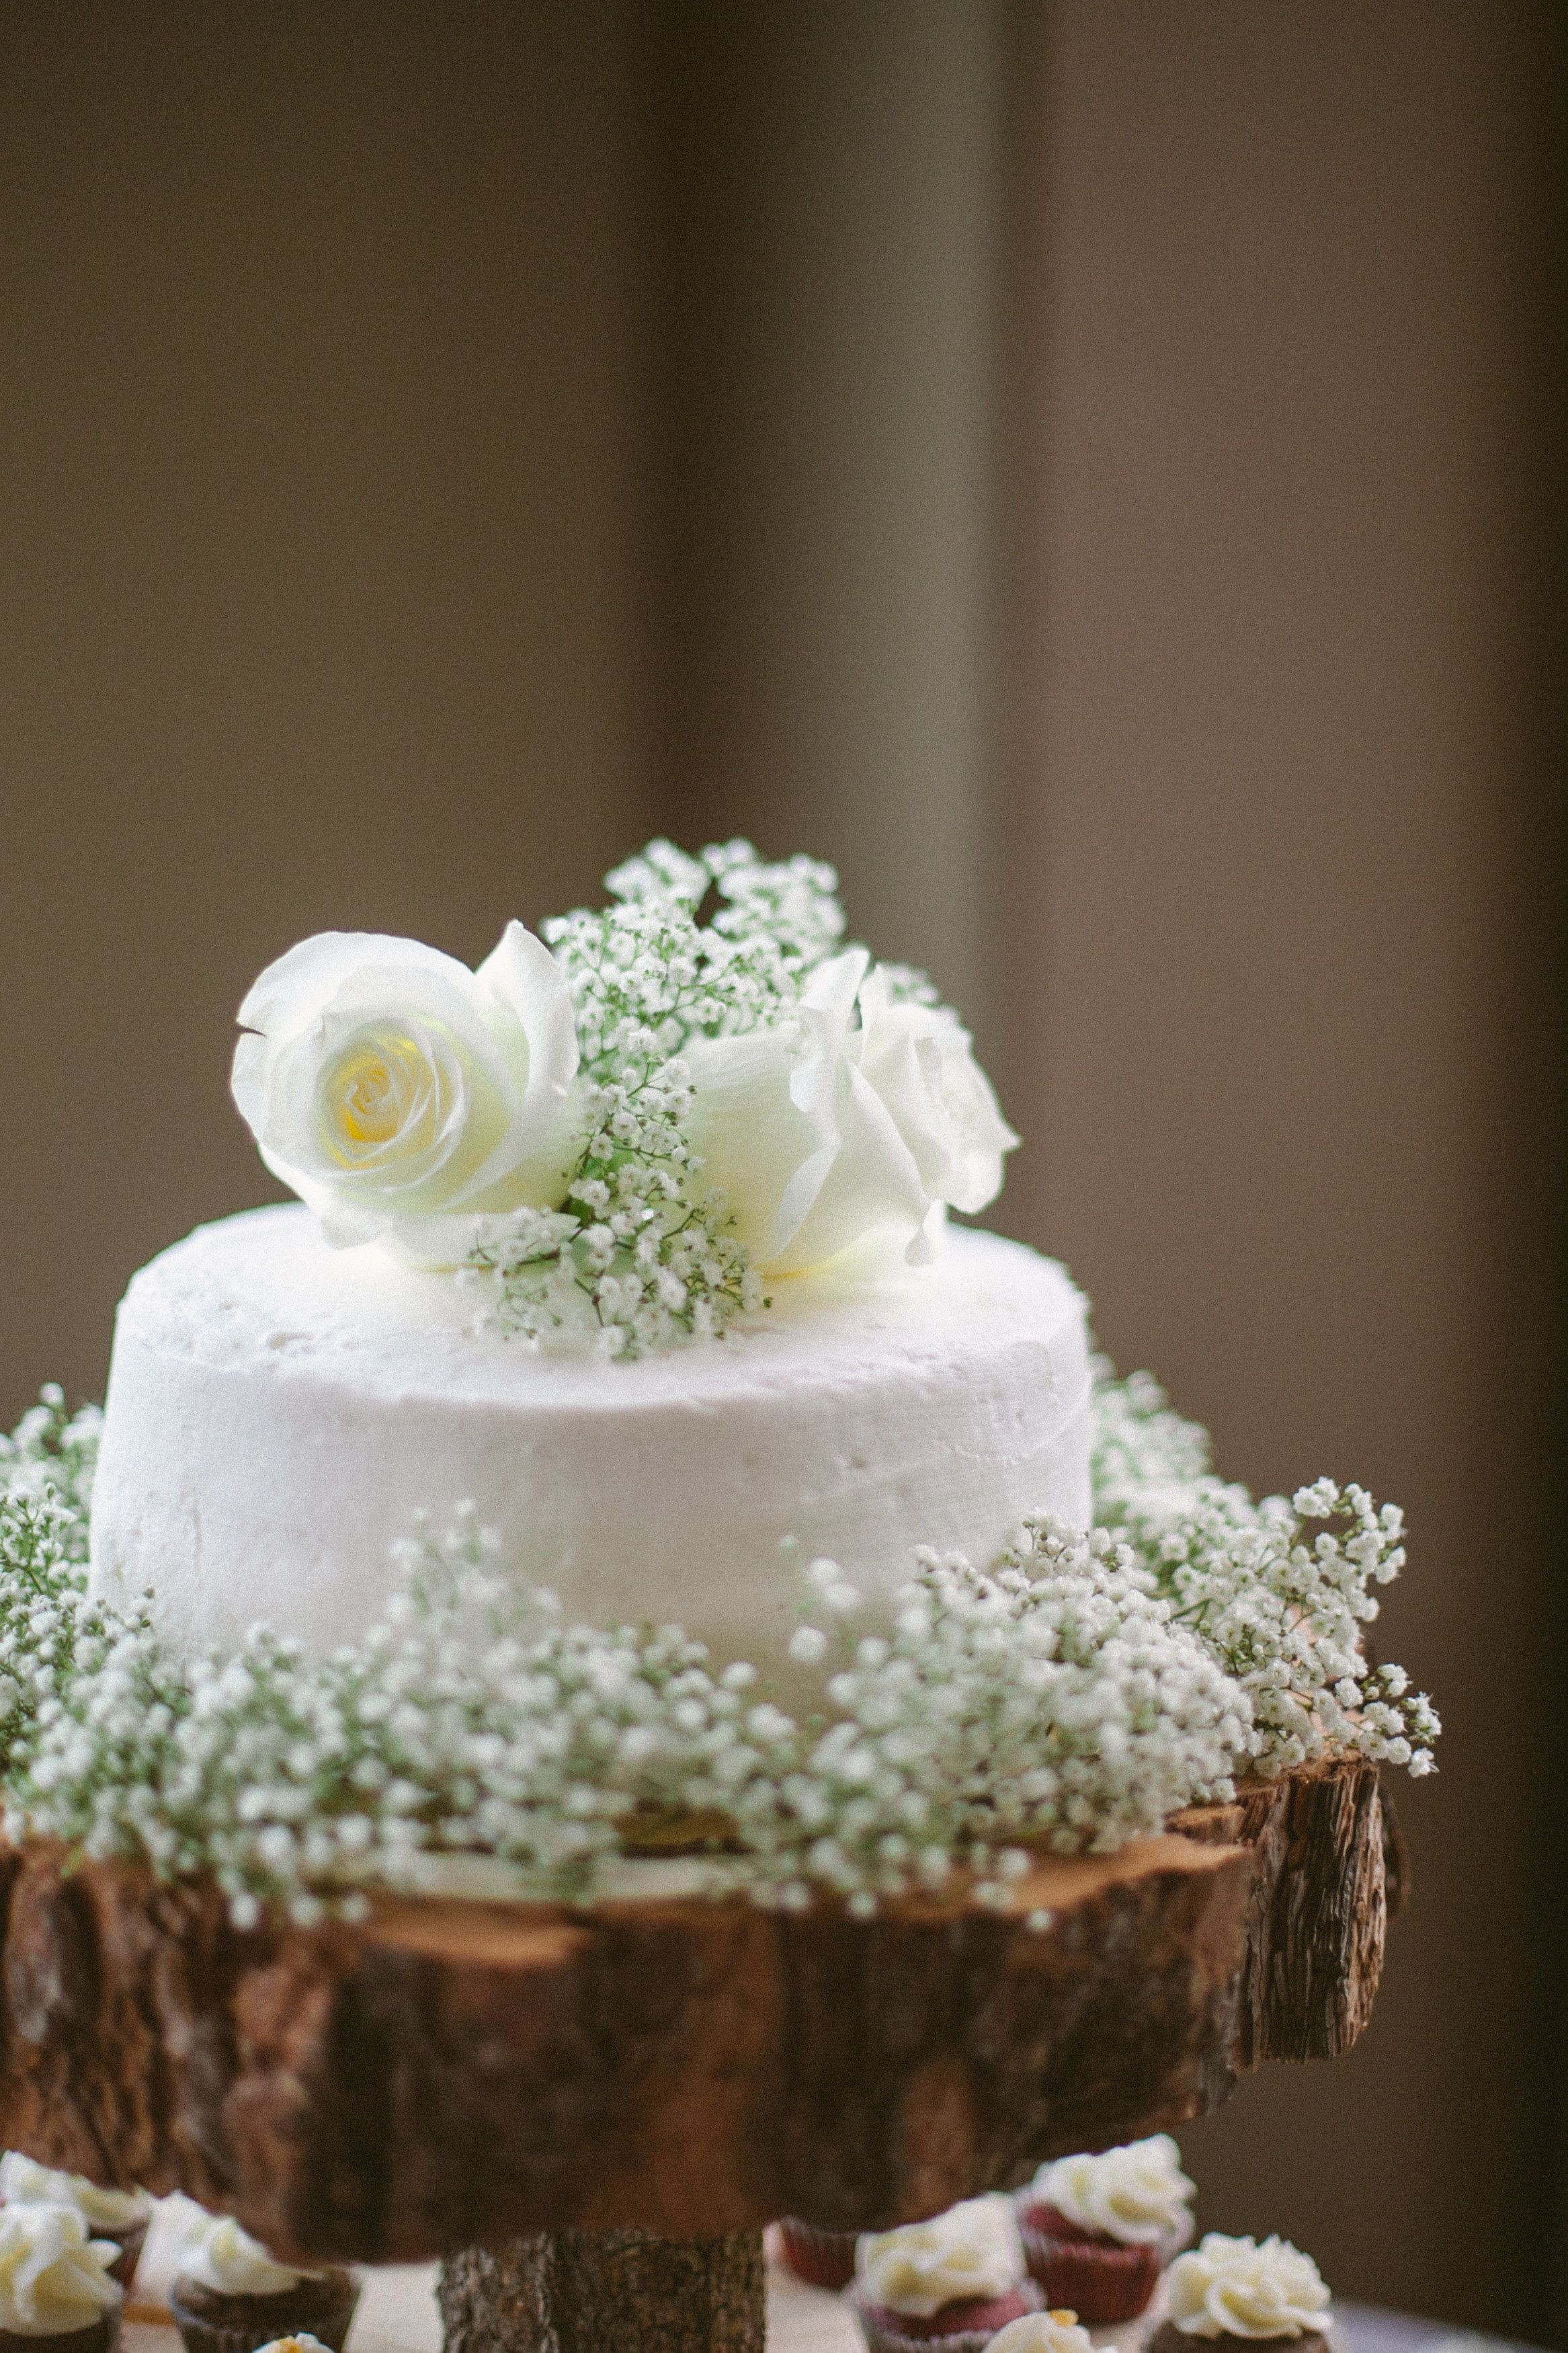 Simple One Tier Wedding Cakes  e Tier White Buttercream Wedding Cake